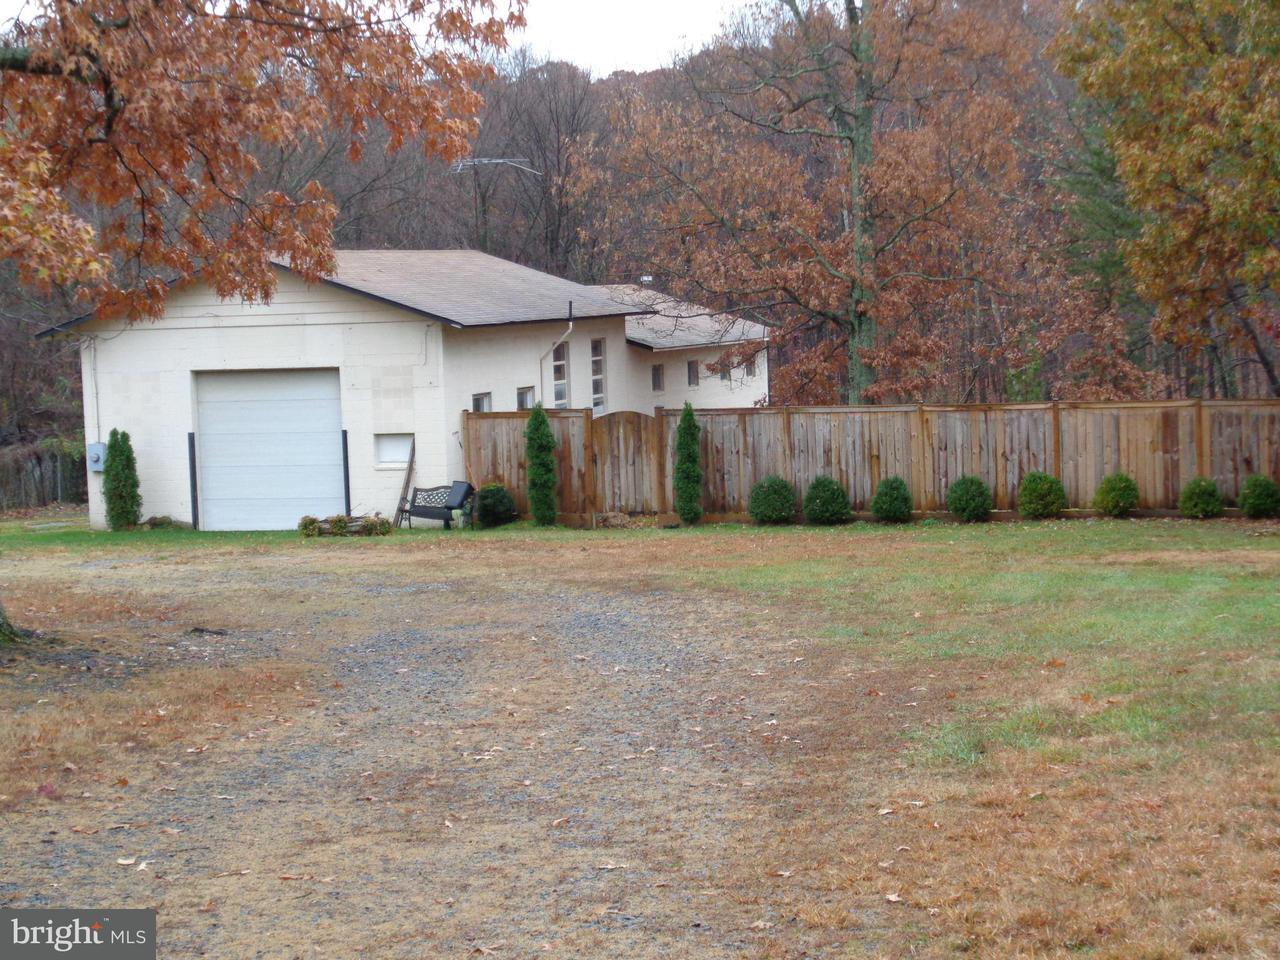 Additional photo for property listing at 4955 PRINCE WILLIAM PKWY 4955 PRINCE WILLIAM PKWY Woodbridge, Βιρτζινια 22192 Ηνωμενεσ Πολιτειεσ